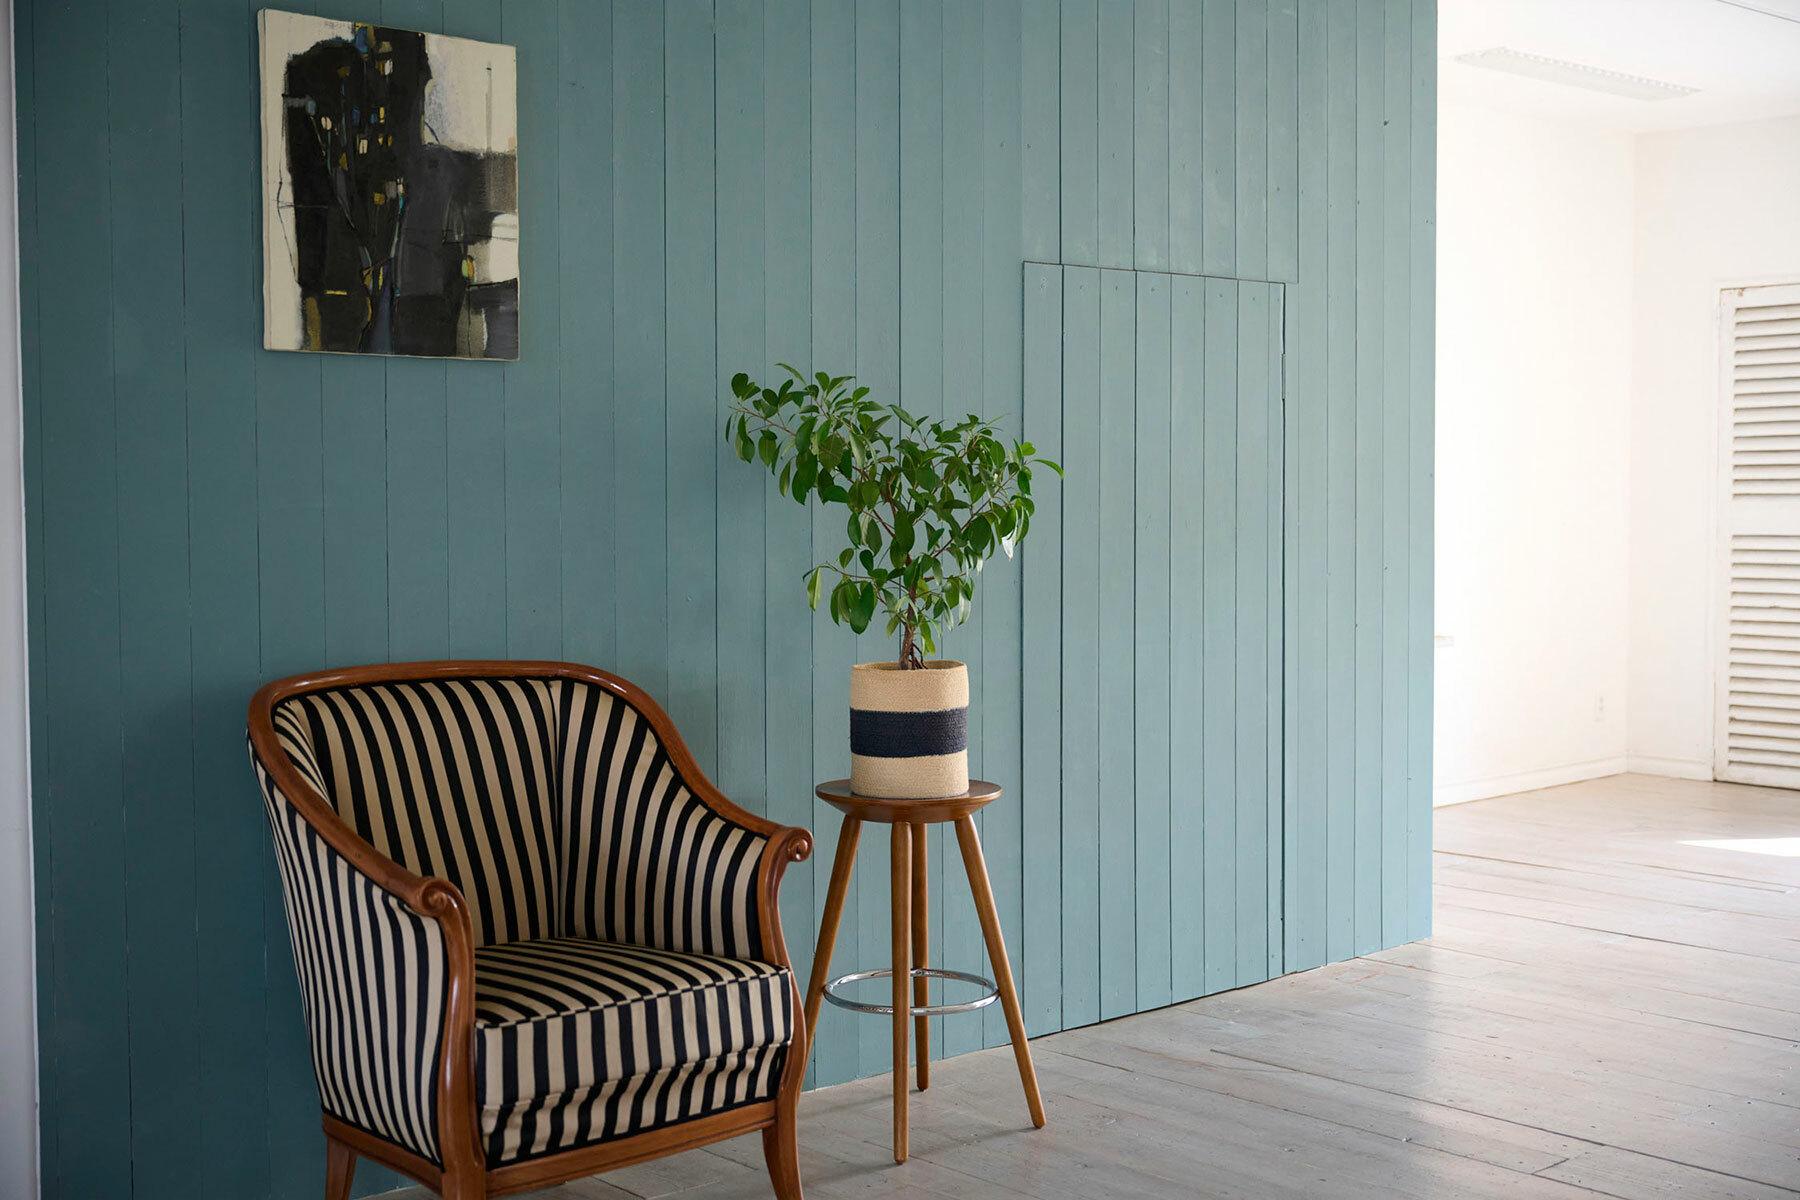 STUDIO FOGLIA 2st (スタジオ フォグリア 2st)稼働の棚と薄いグレー壁